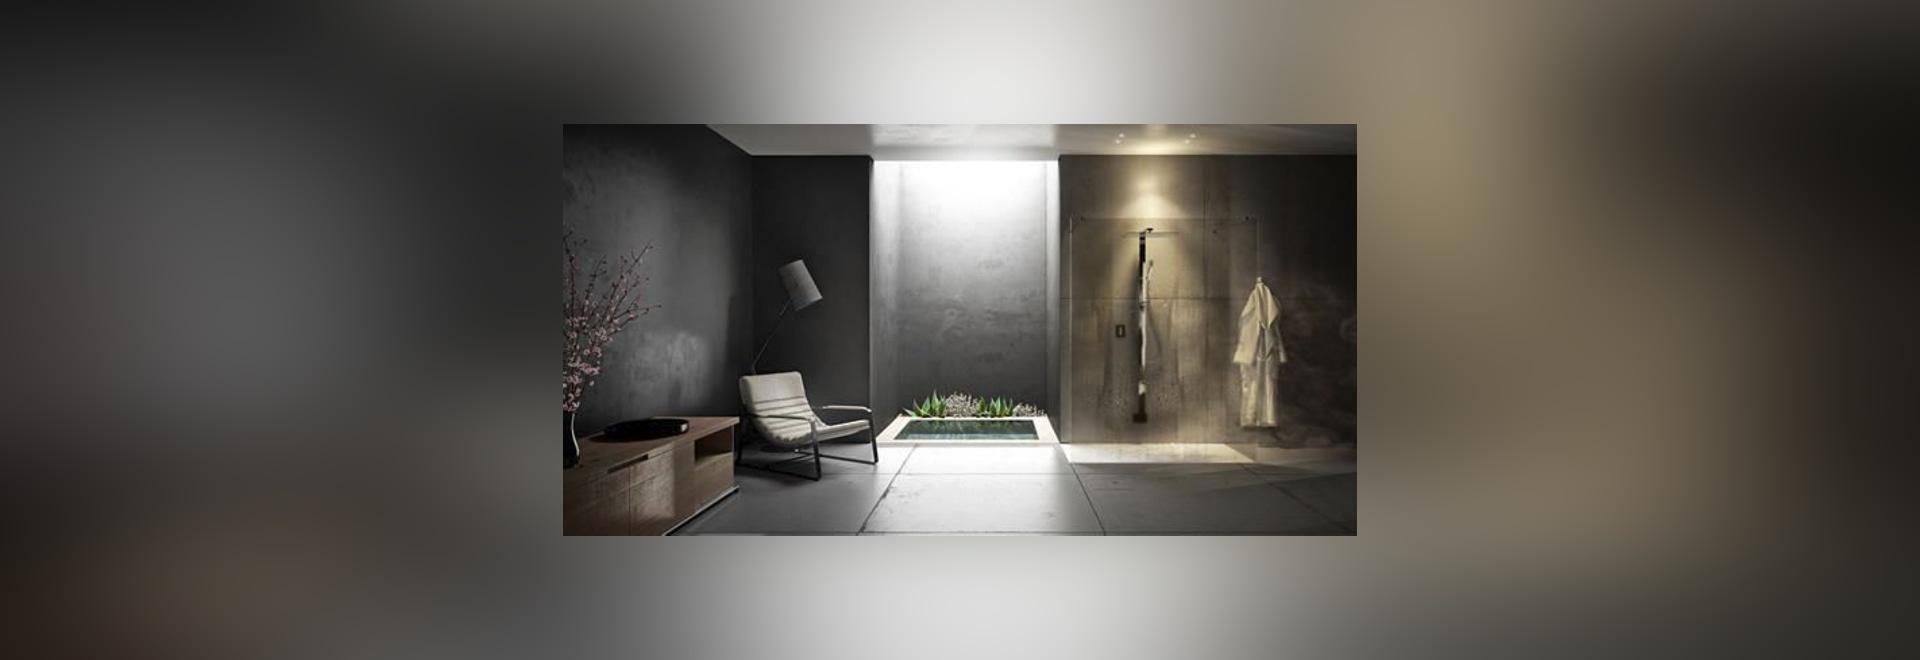 VEHLA_MYSLIM durch CARIMALI Entwurf shower_space